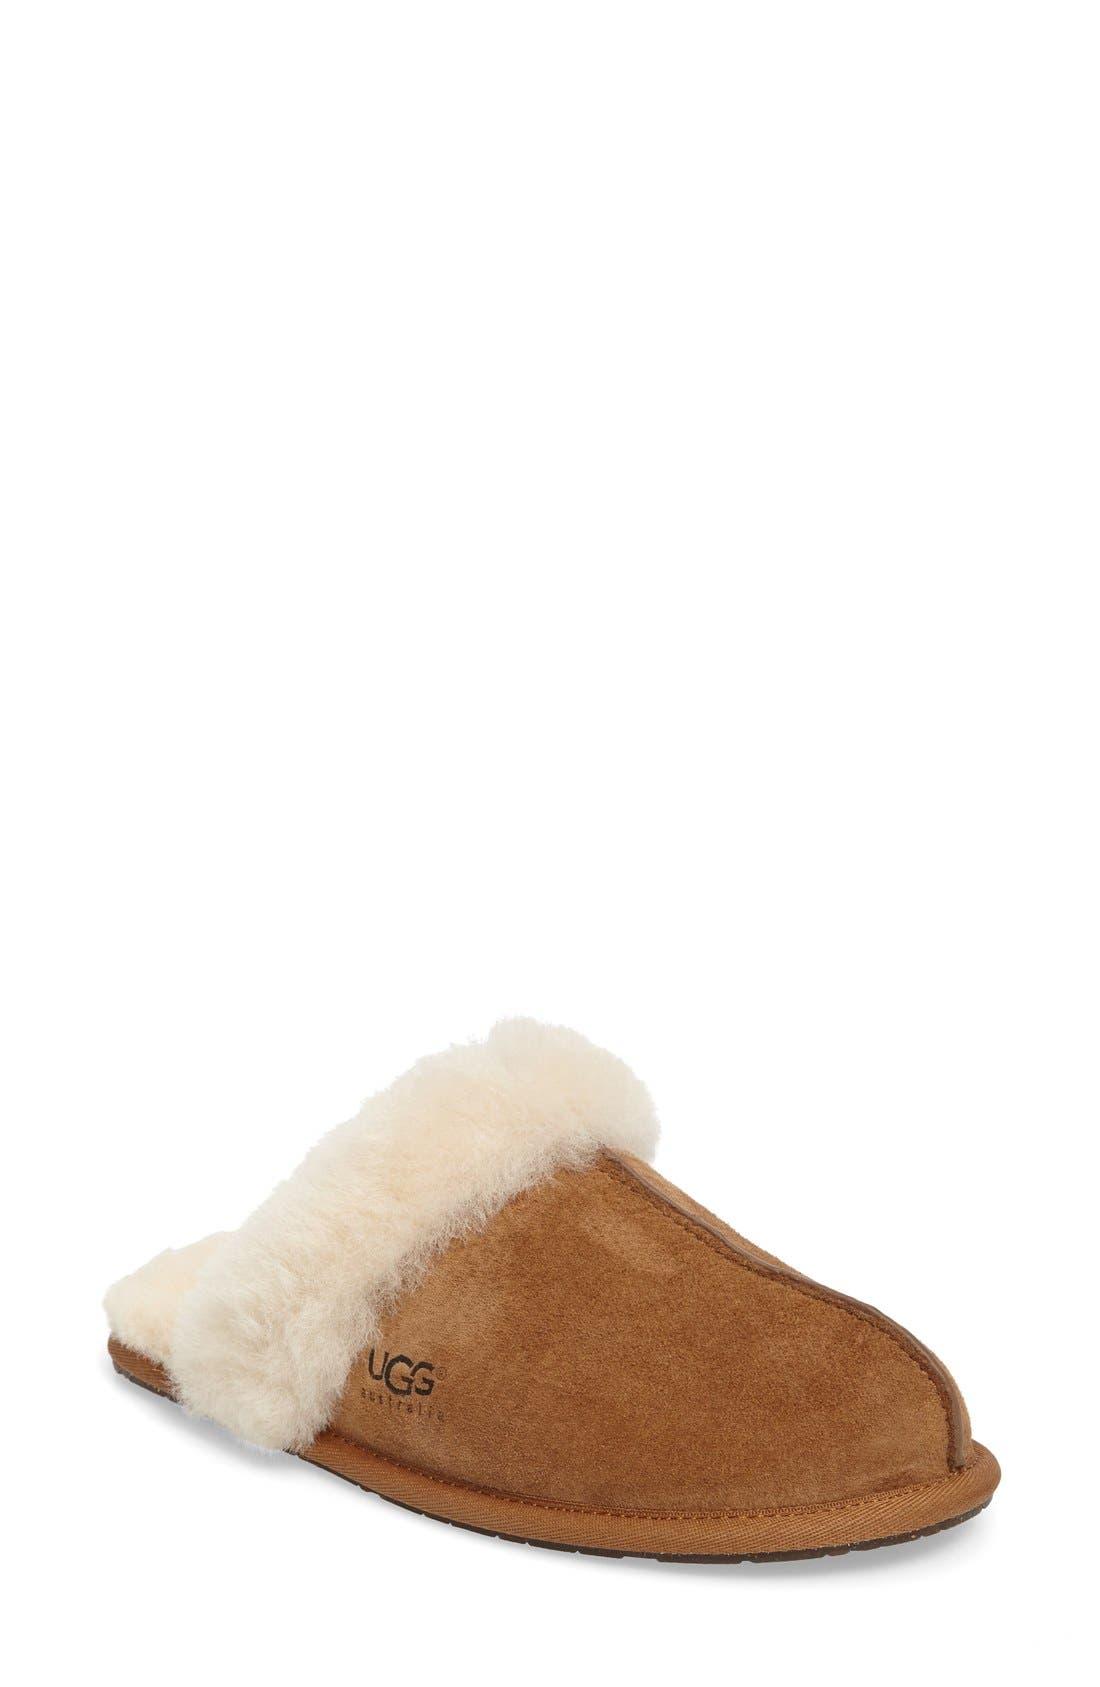 Women's Brown Slippers | Nordstrom